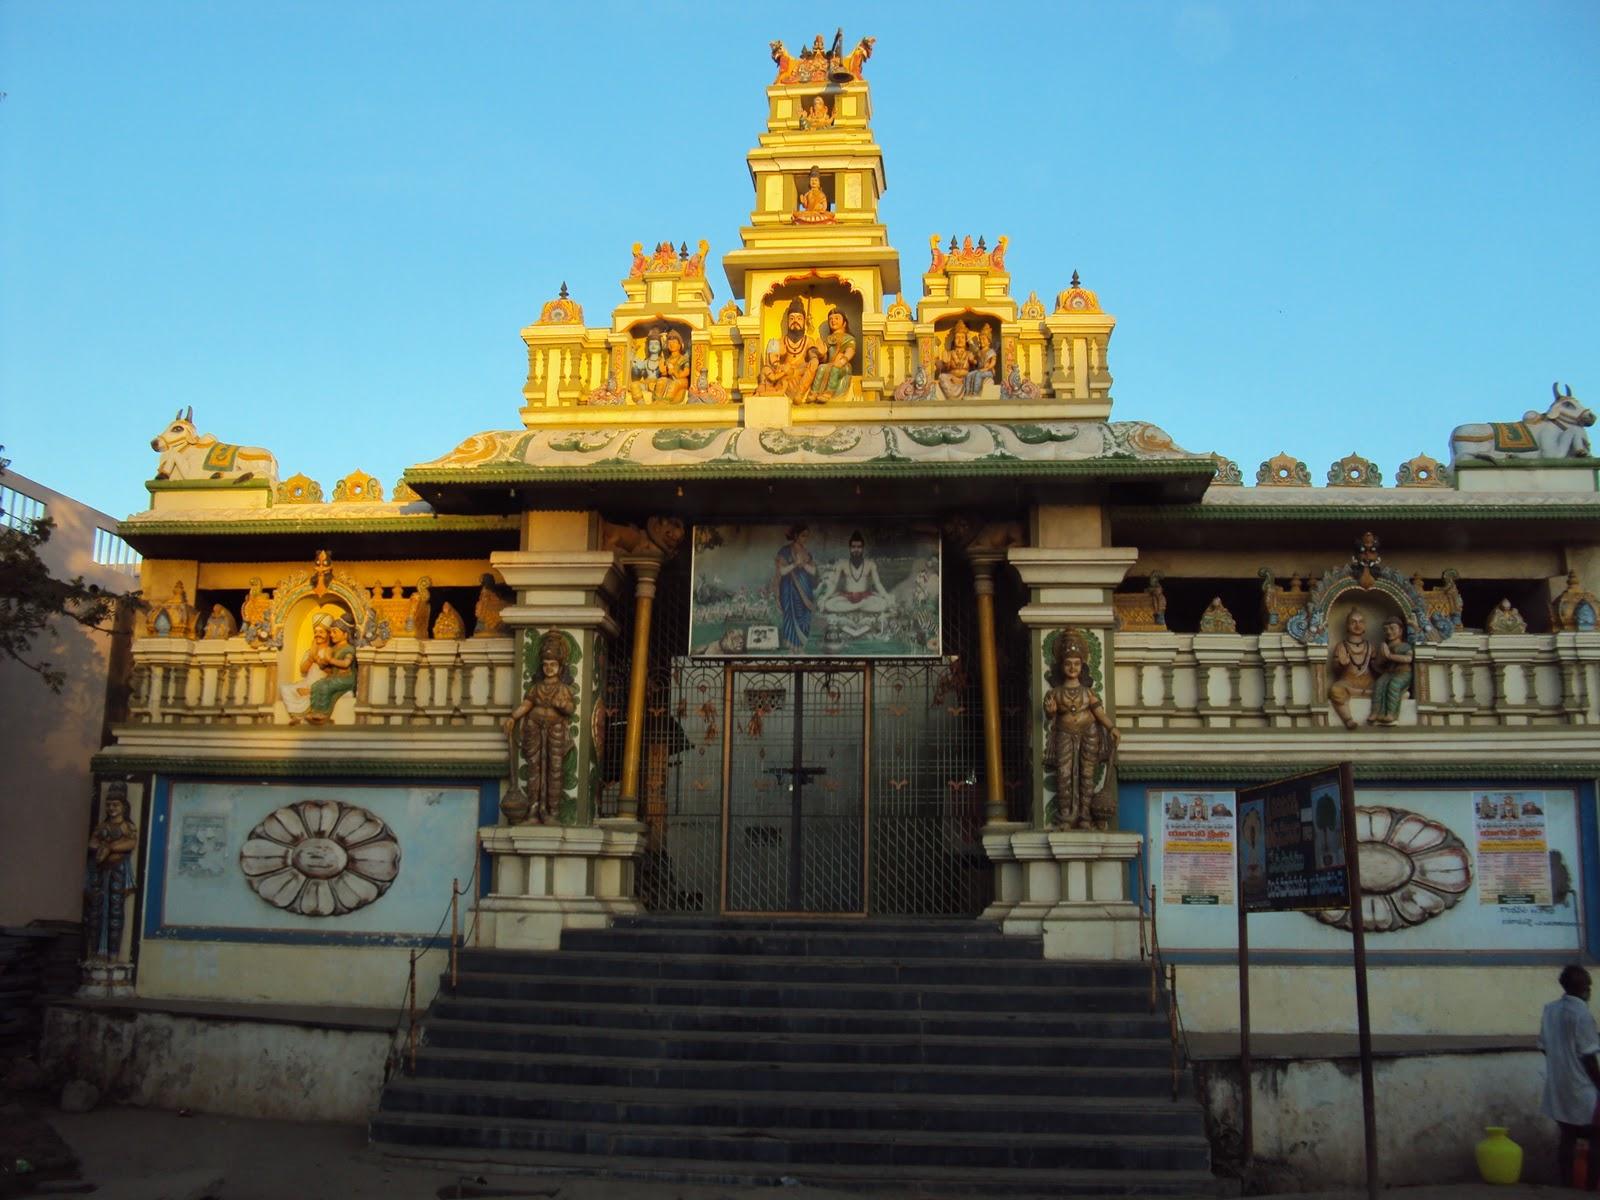 Veera brahmendra swamy temple in bangalore dating